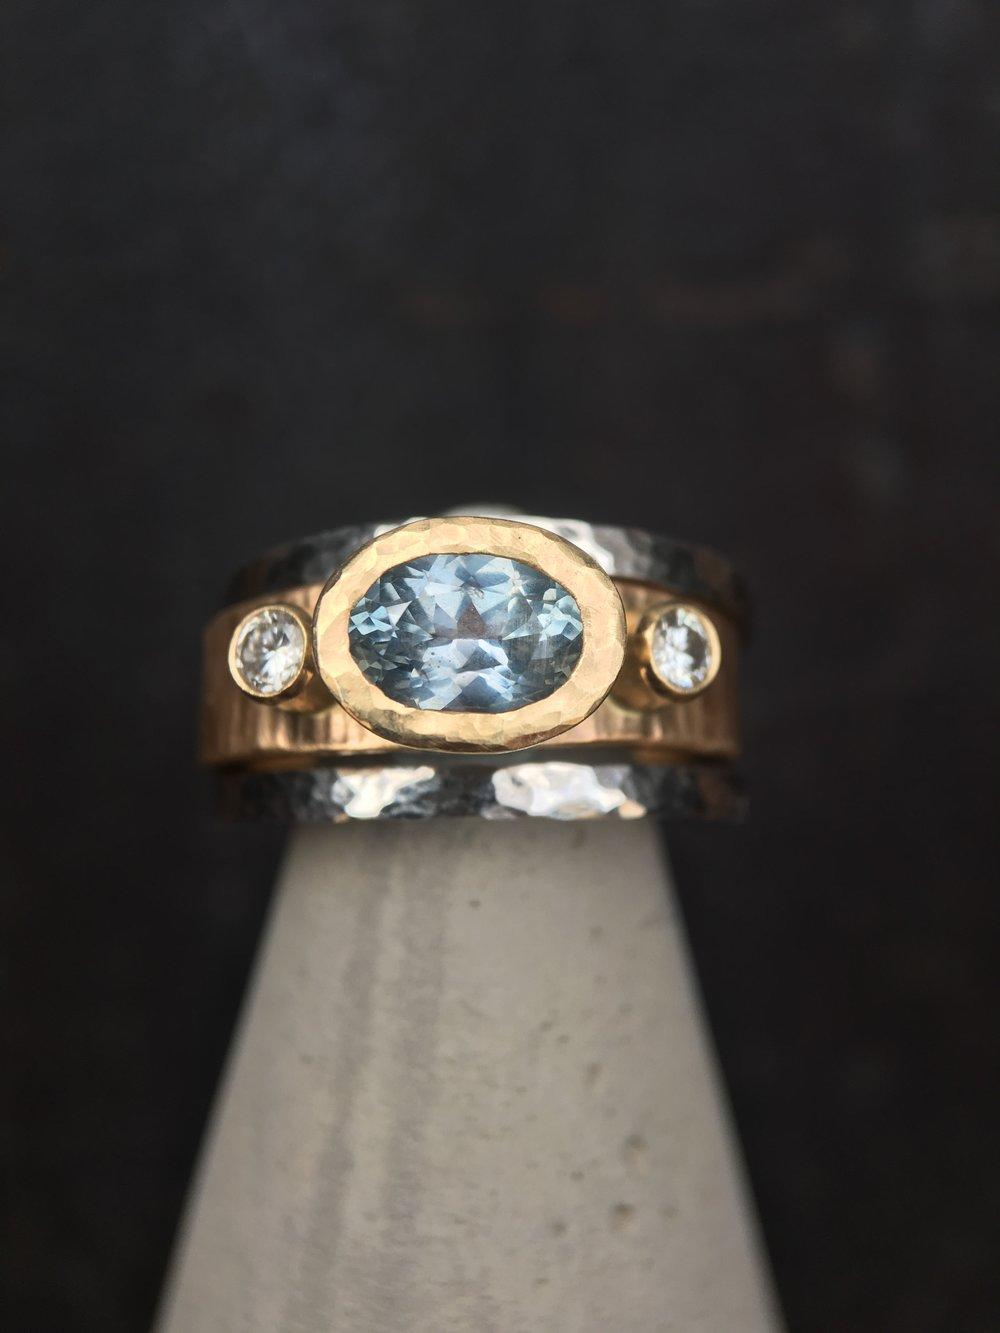 Montana Sapphire Diamonds 14KT White Gold 14KT Yellow Gold Ring